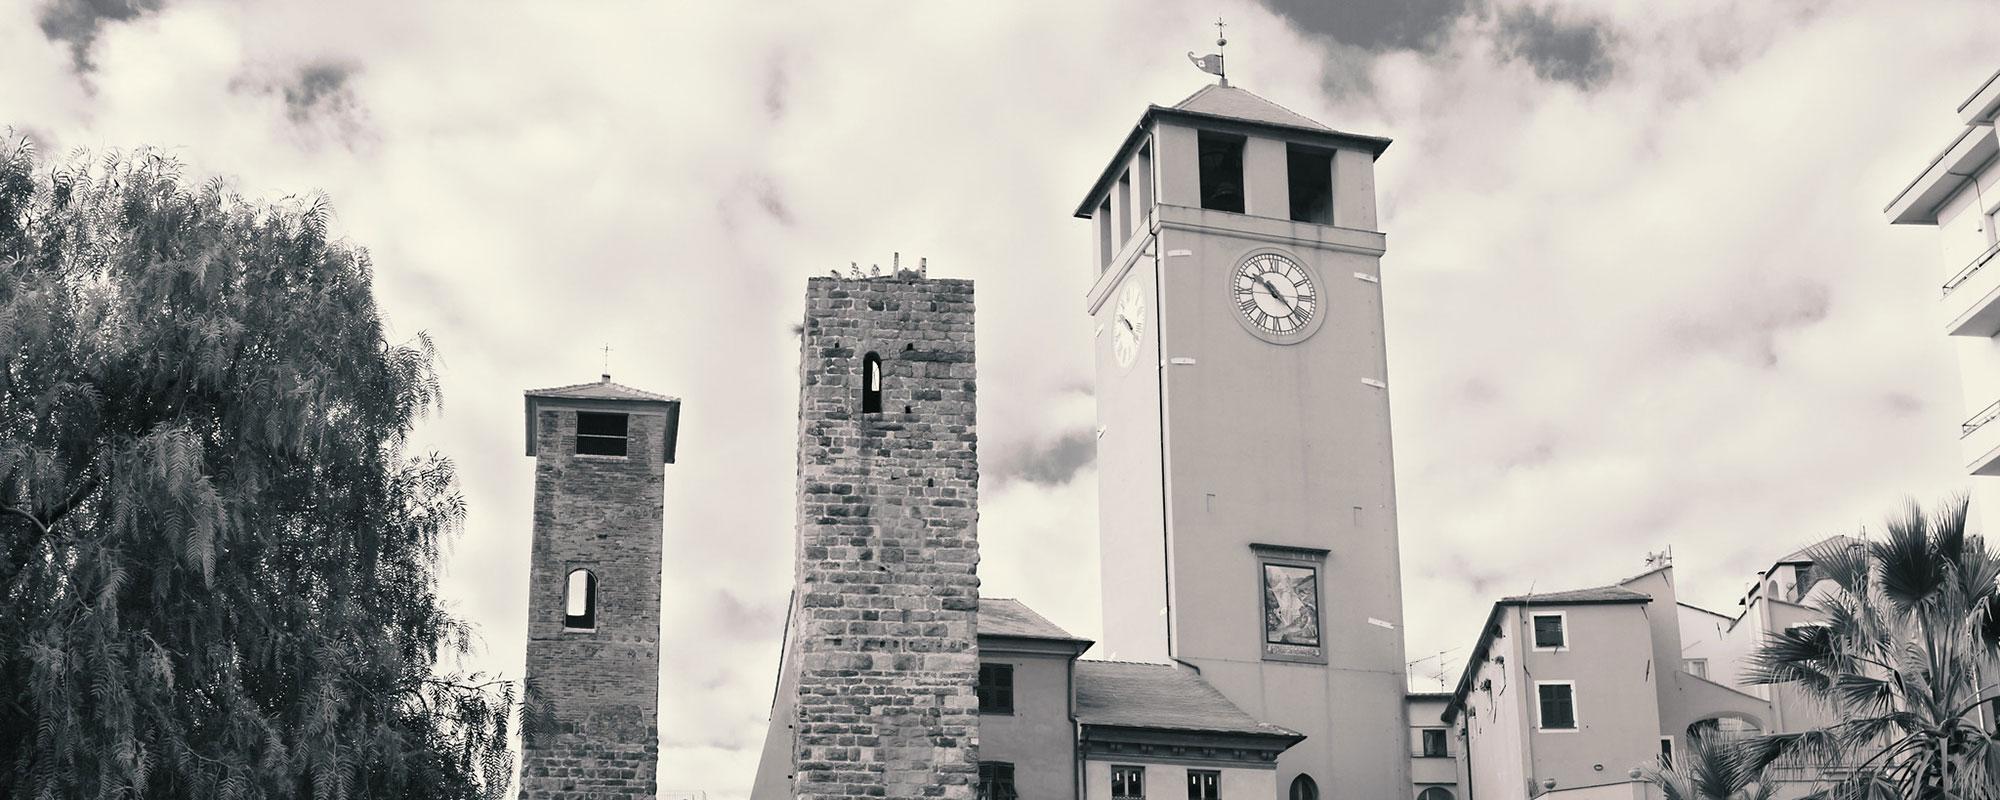 Le Torri di Savona, Riviera ligure di Ponente, Liguria